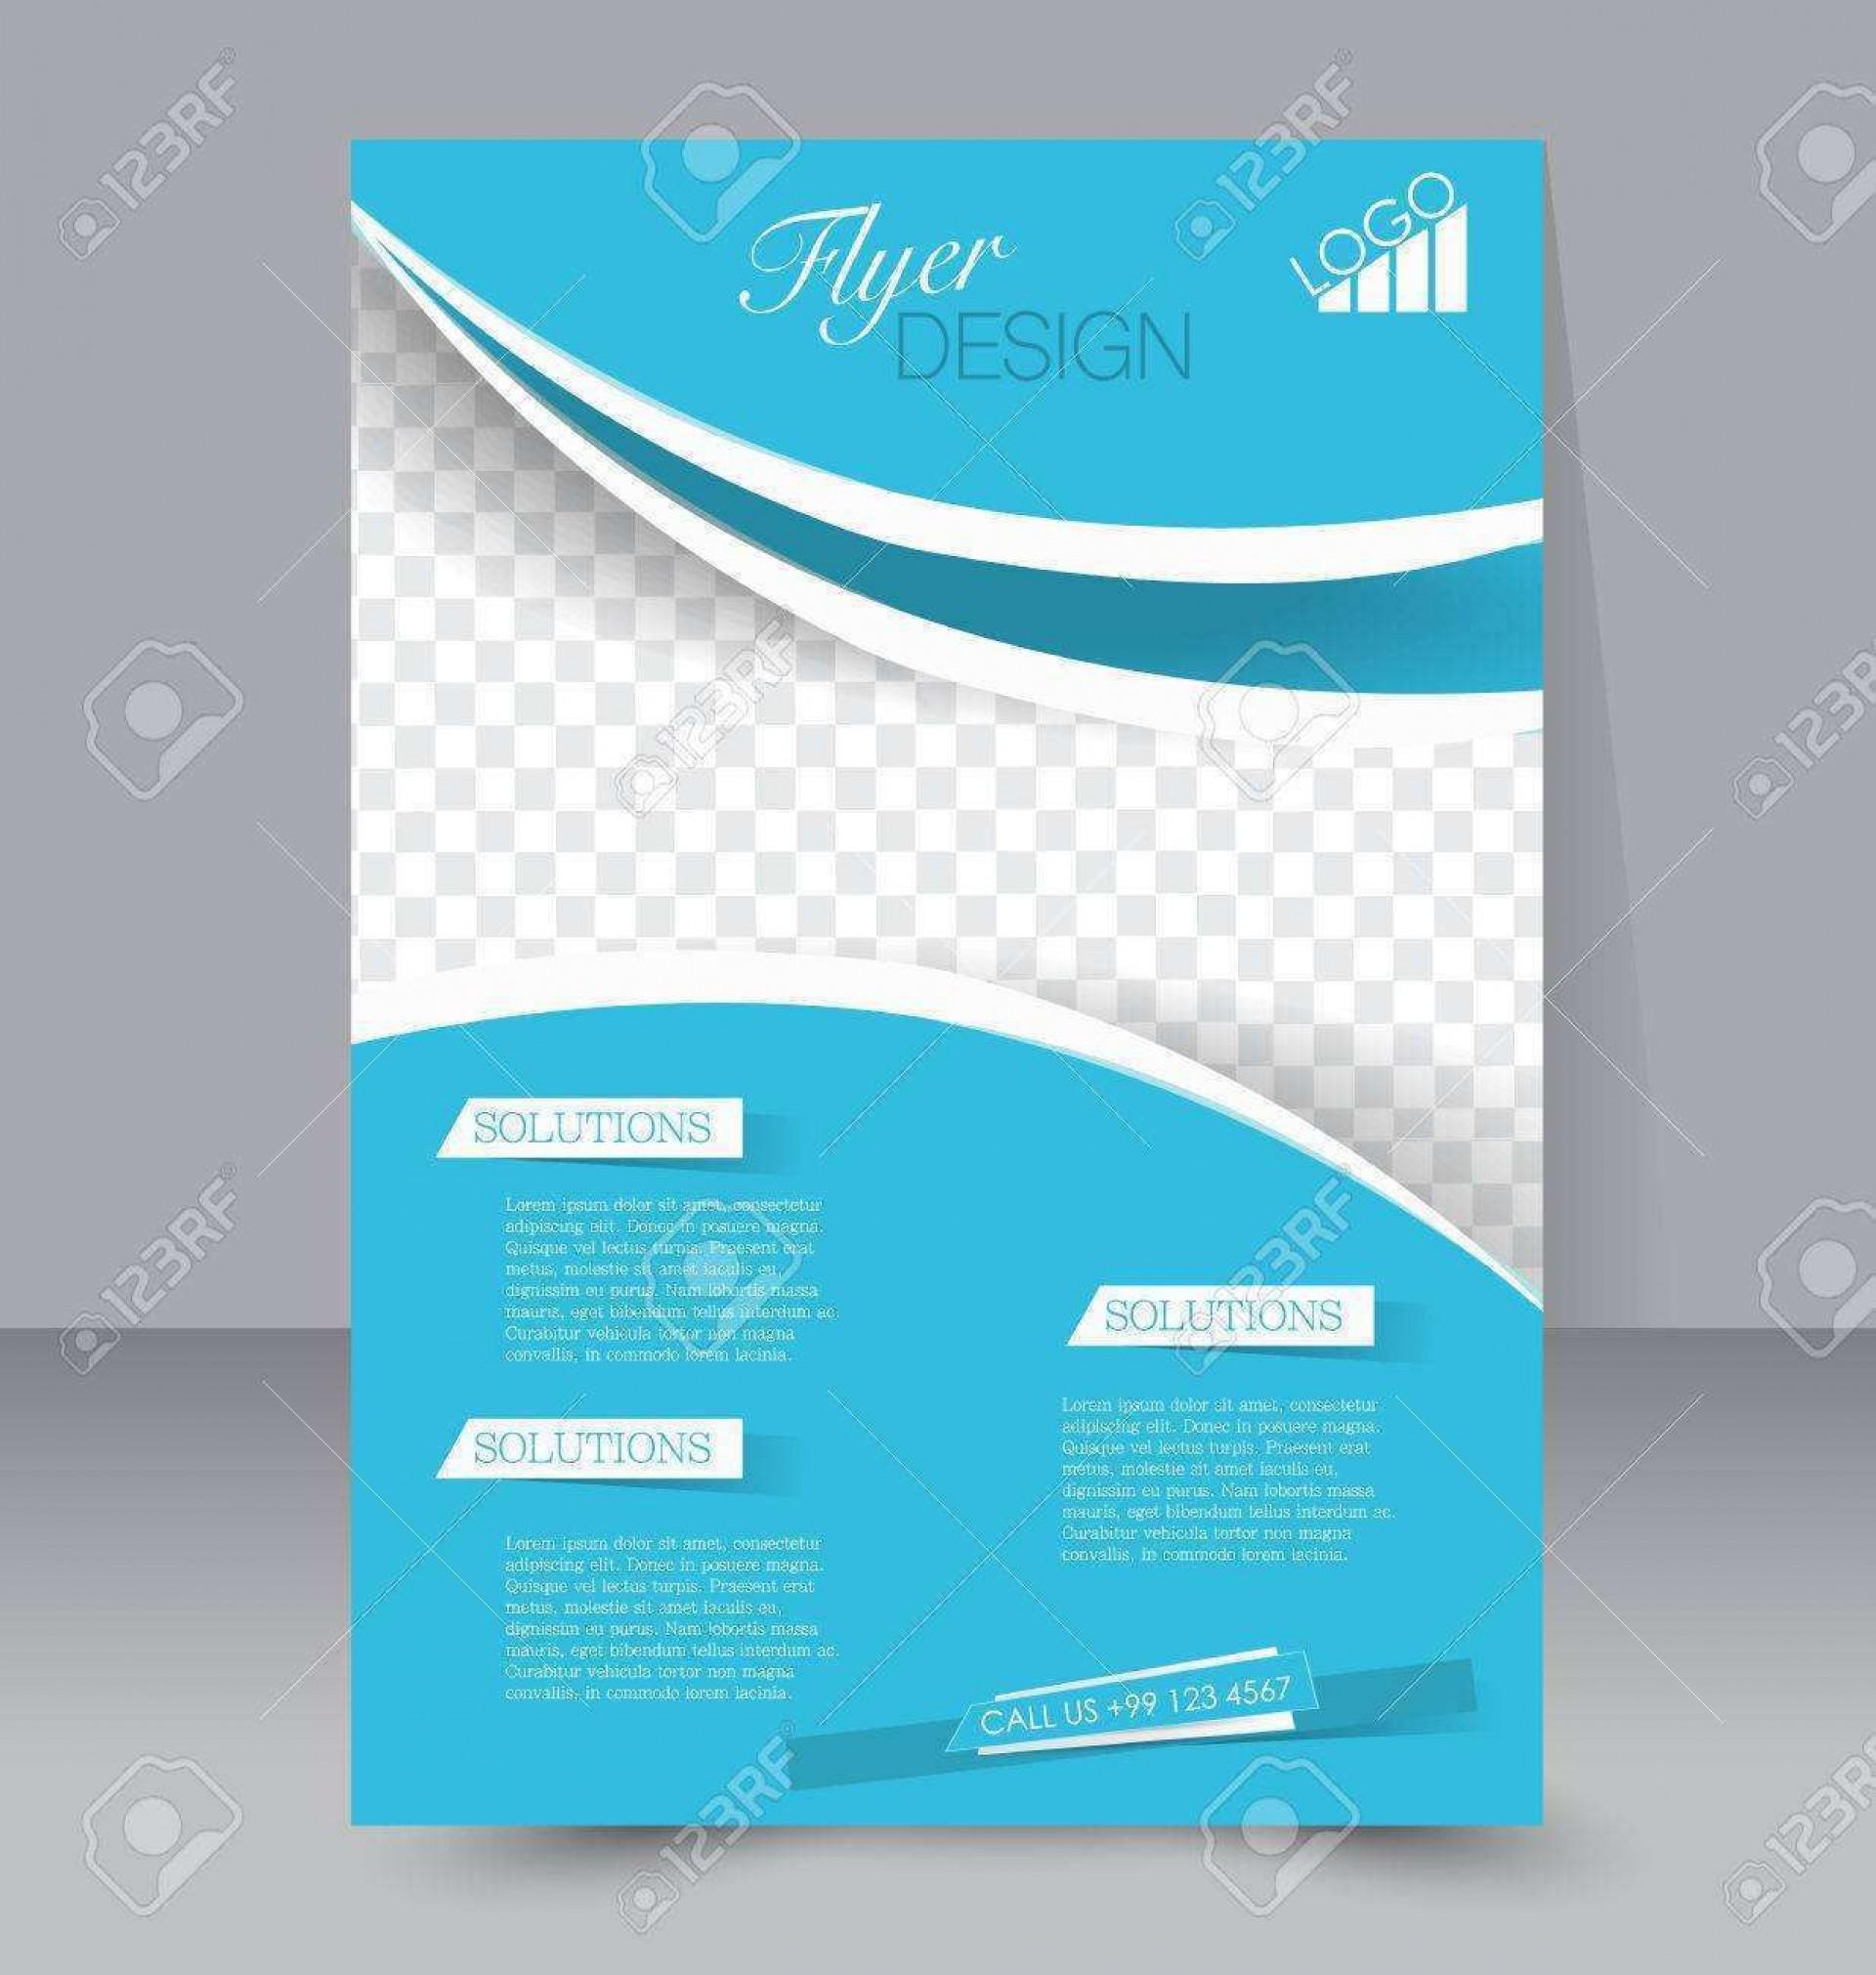 001 Sensational Free Editable Flyer Template High Def  Busines Fundraising1920